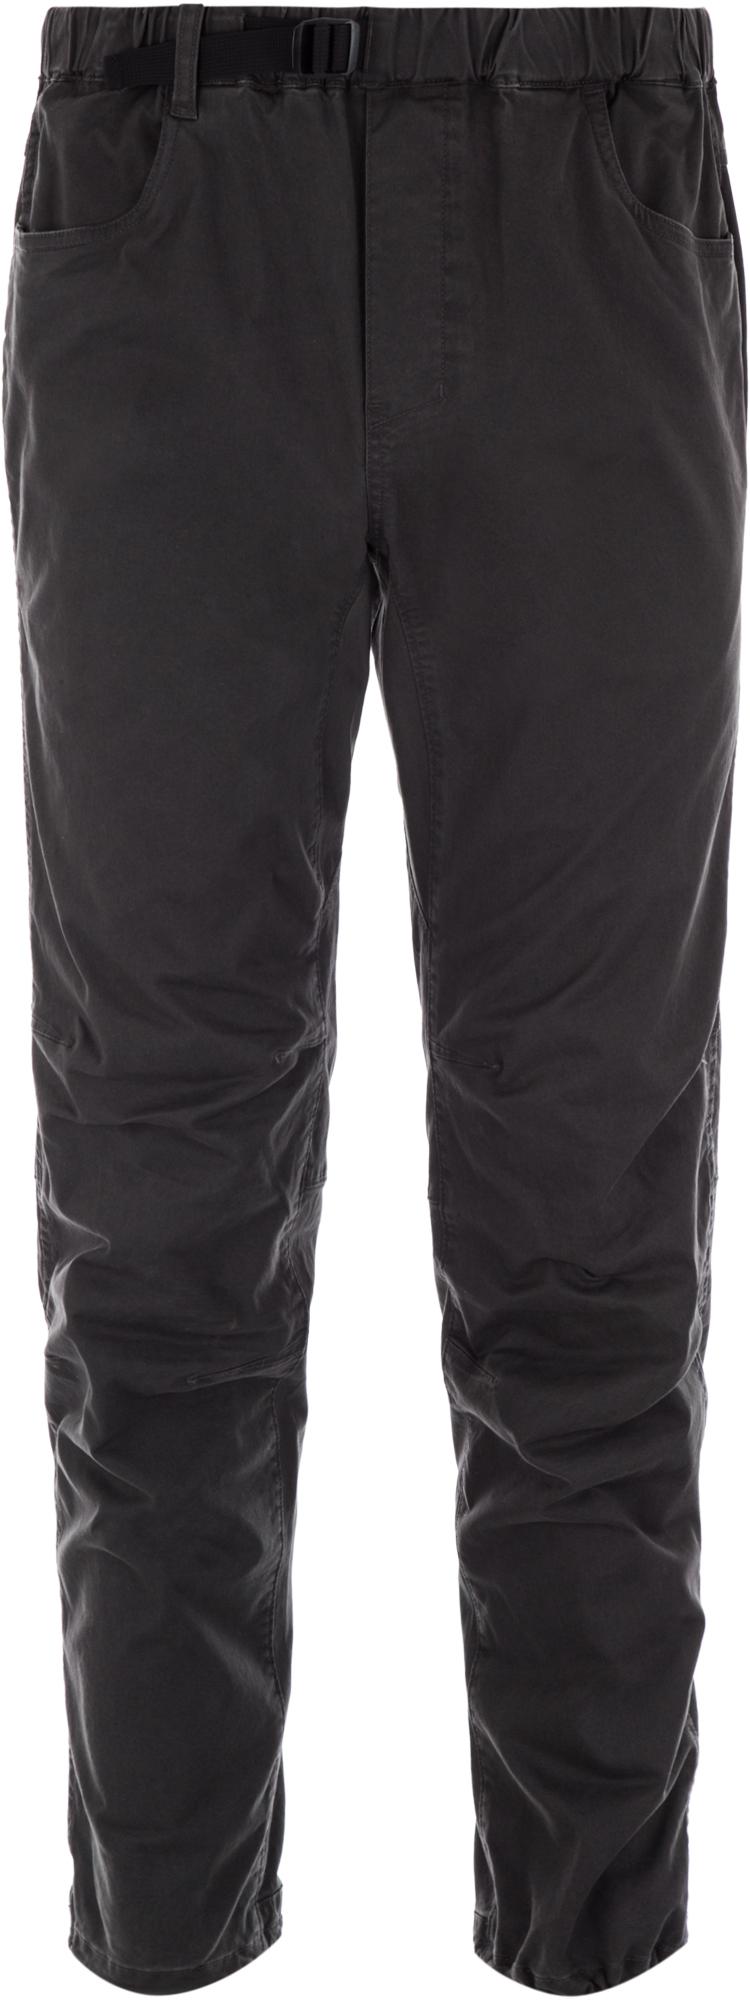 Mountain Hardwear Брюки мужские Mountain Hardwear Cederberg Pull On, размер 54 брюки pull